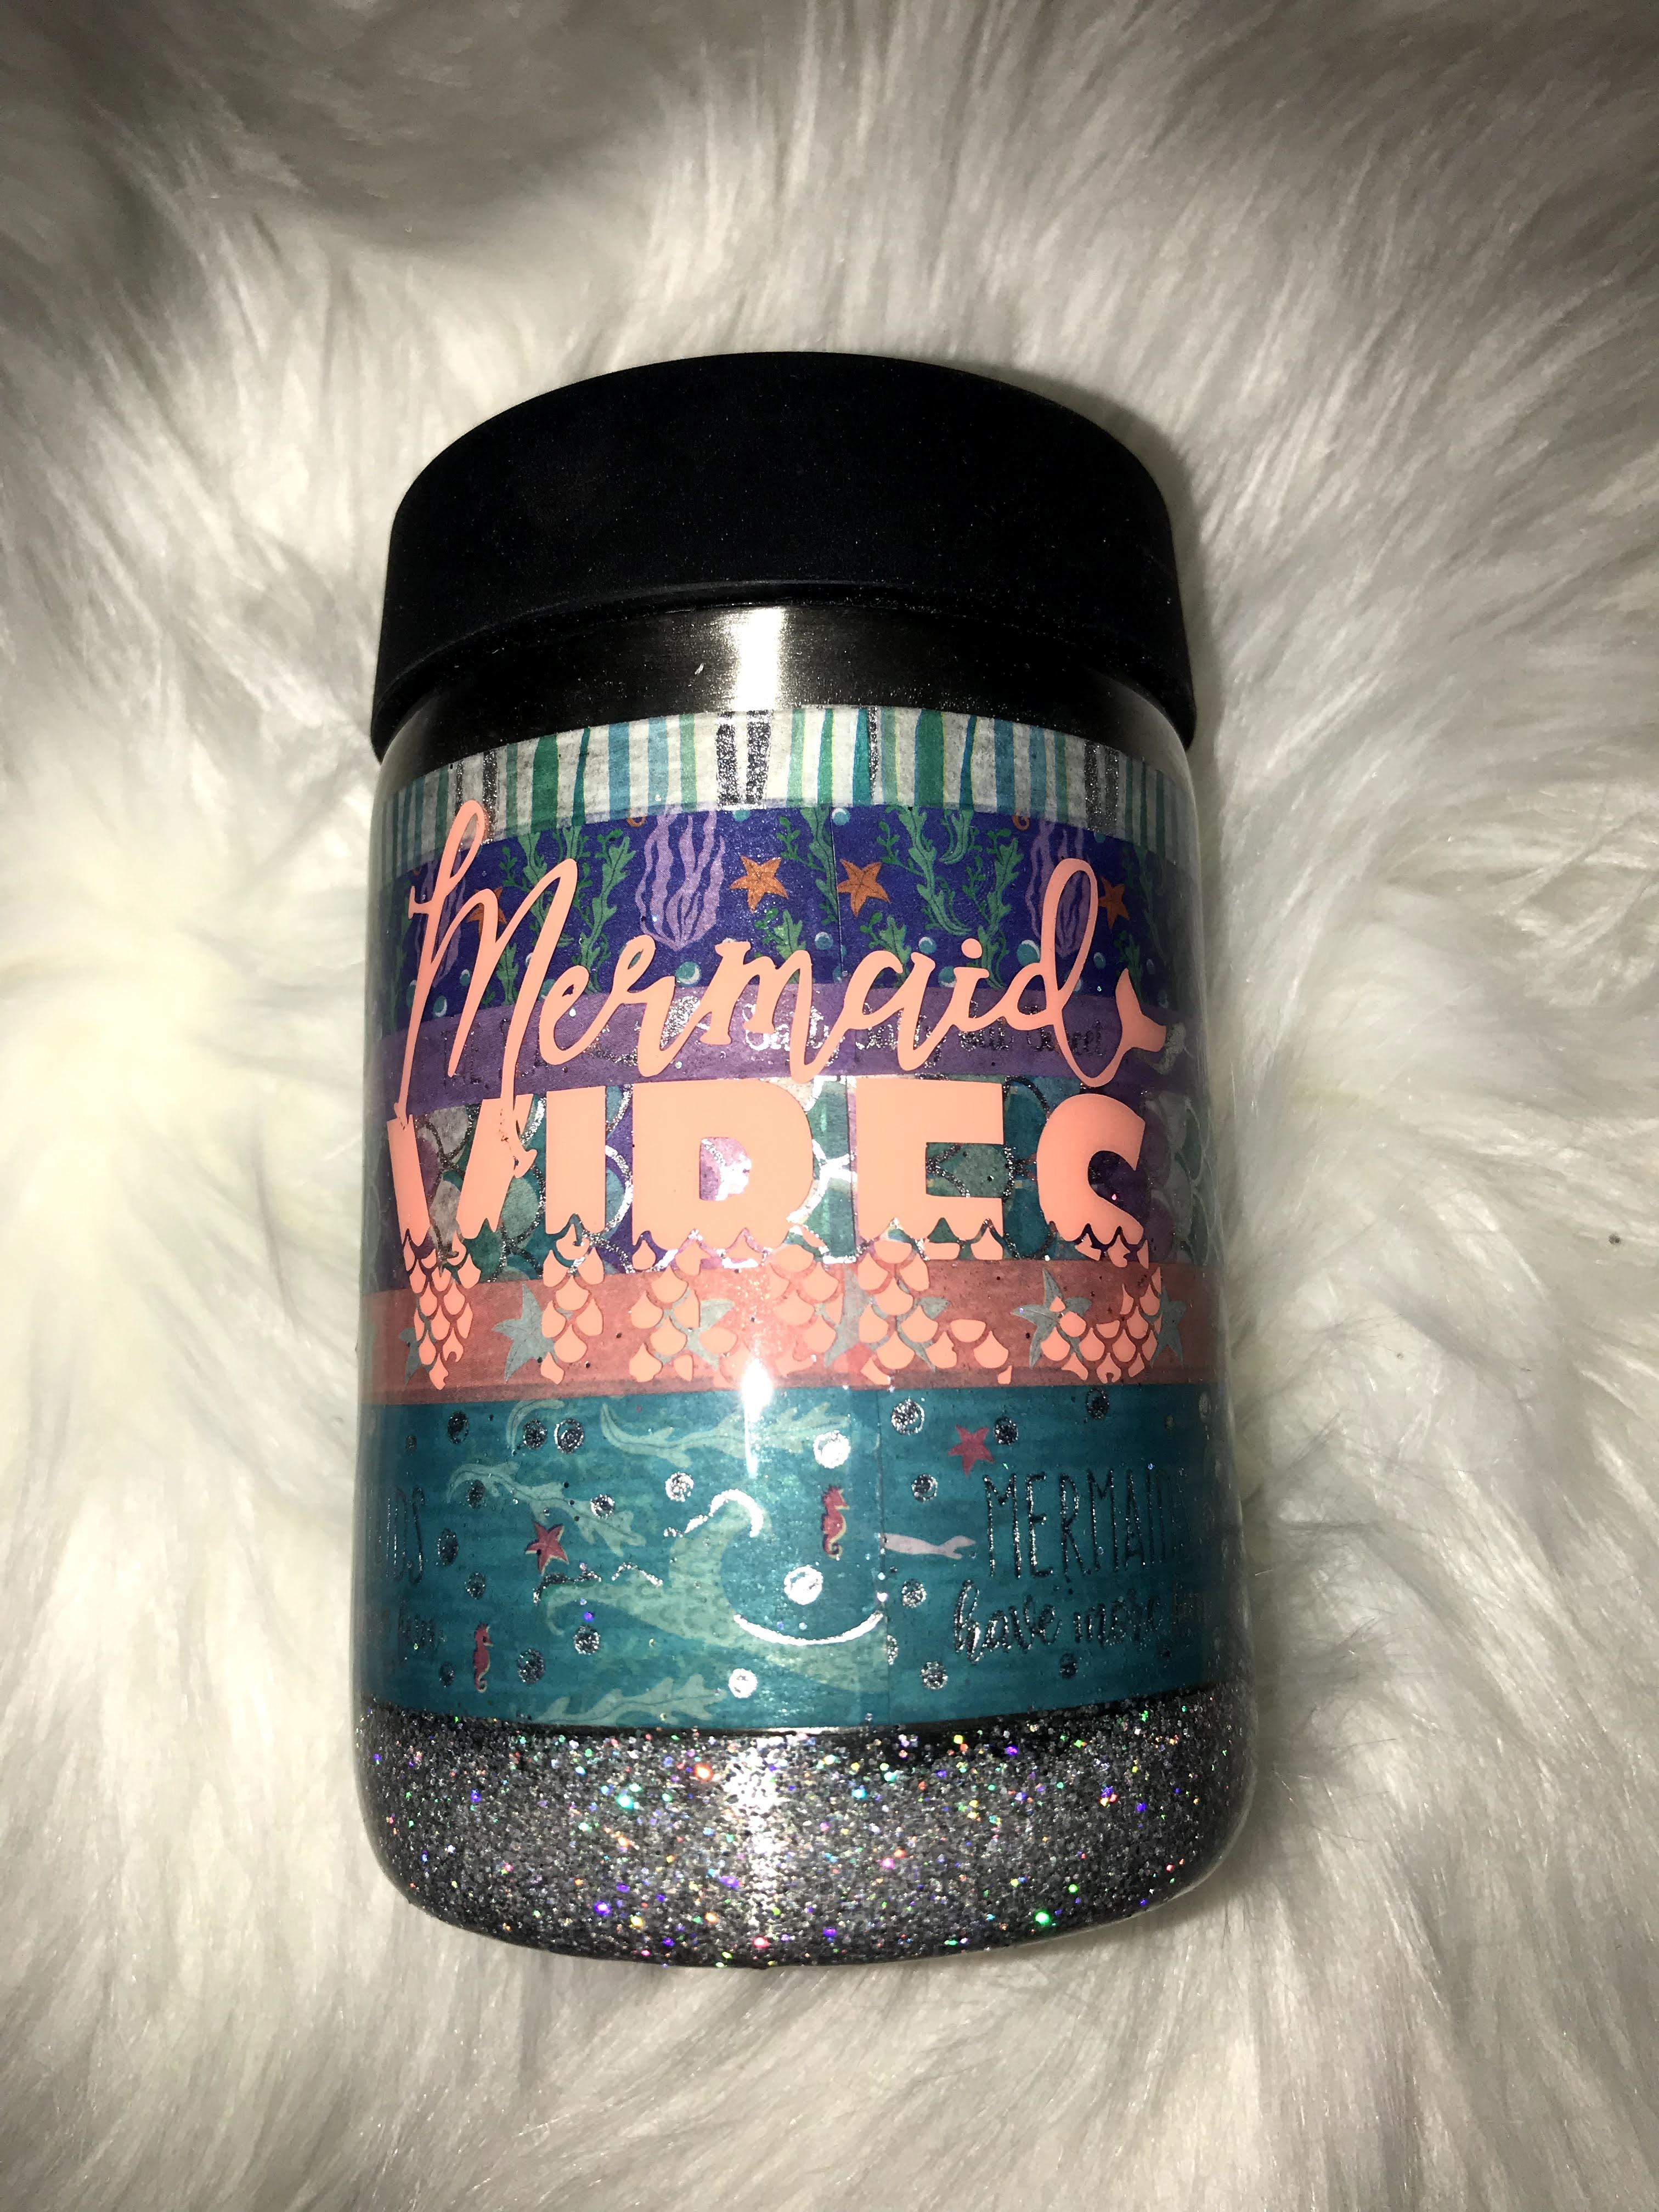 Thumbnail: Mermaid Vibes Can/bottle Koozie